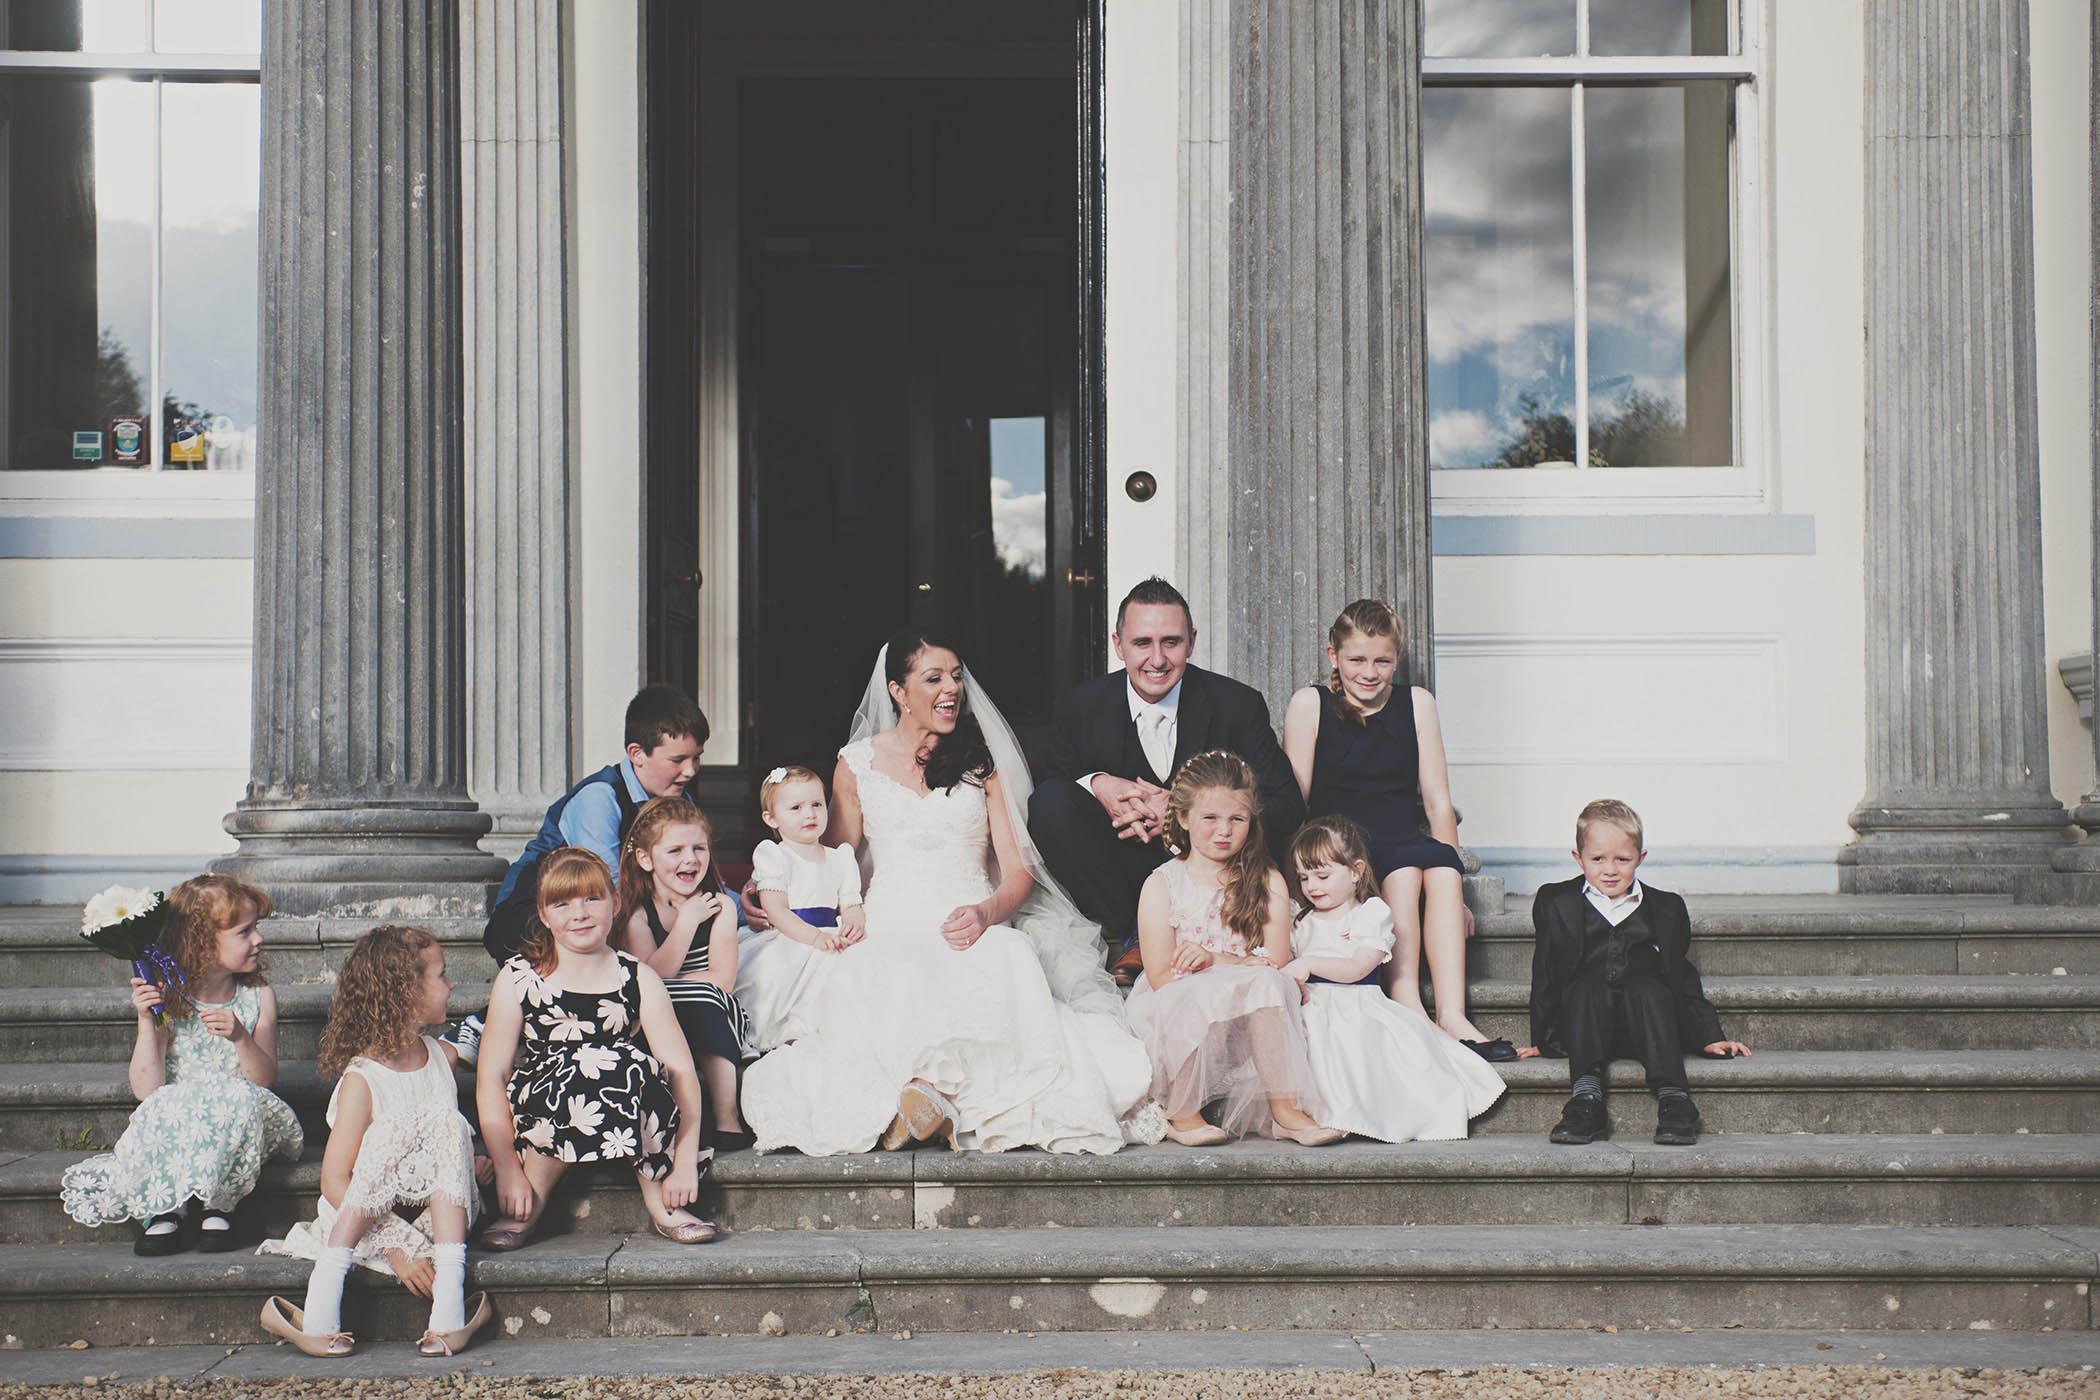 Studio33 Weddings, party photograph